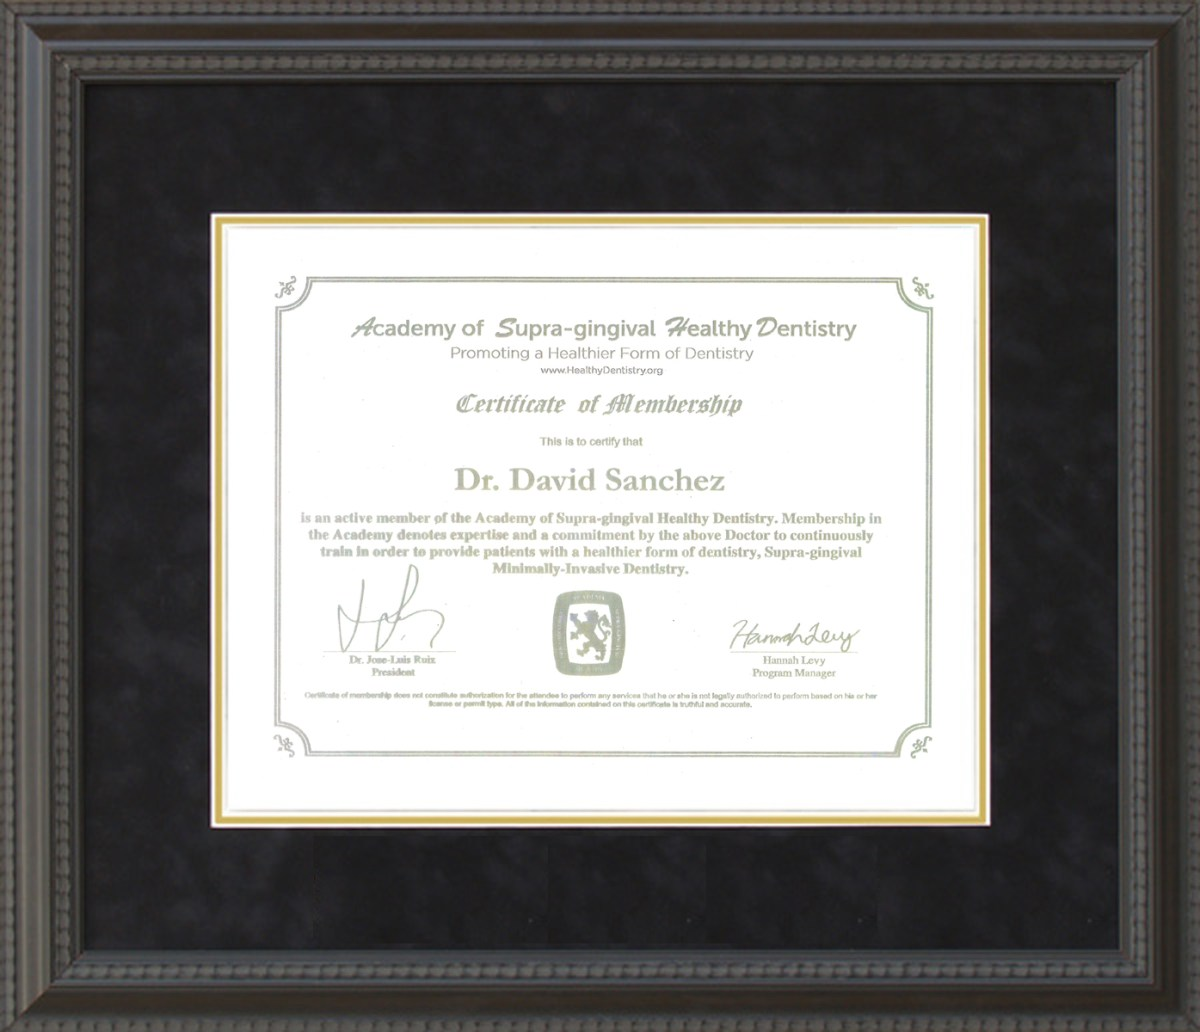 Supra-gingival, Minimally-Invasive Dentistry Certificate